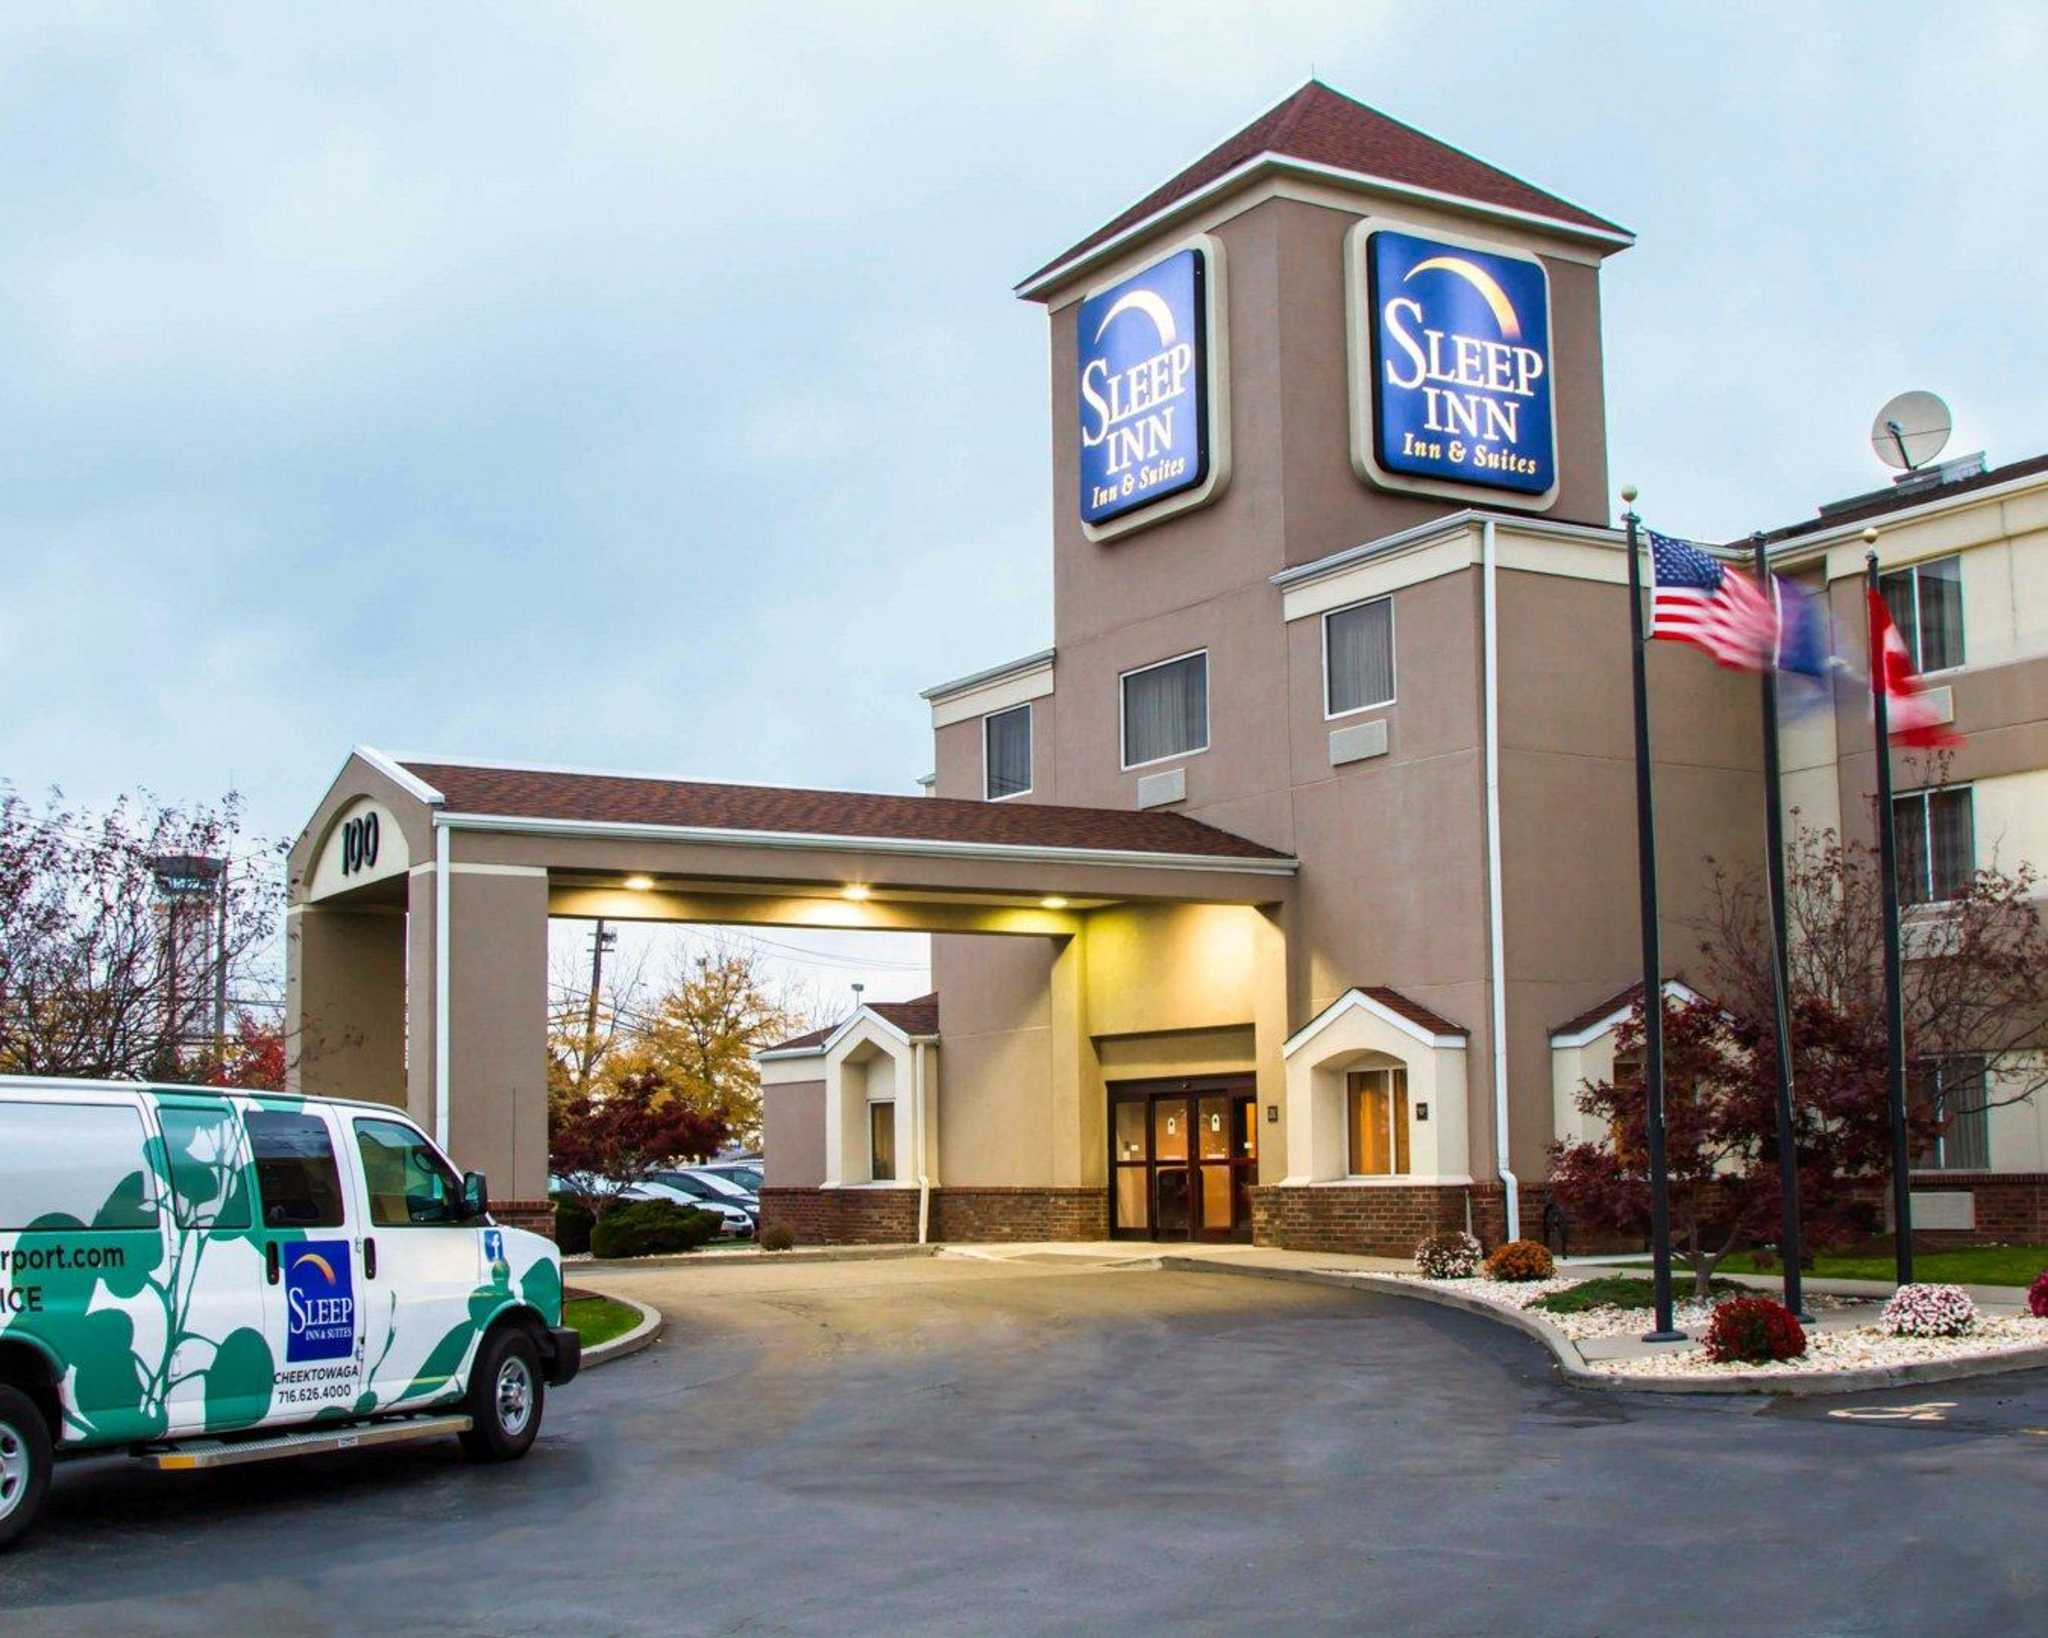 Sleep Inn & Suites Buffalo Airport image 2